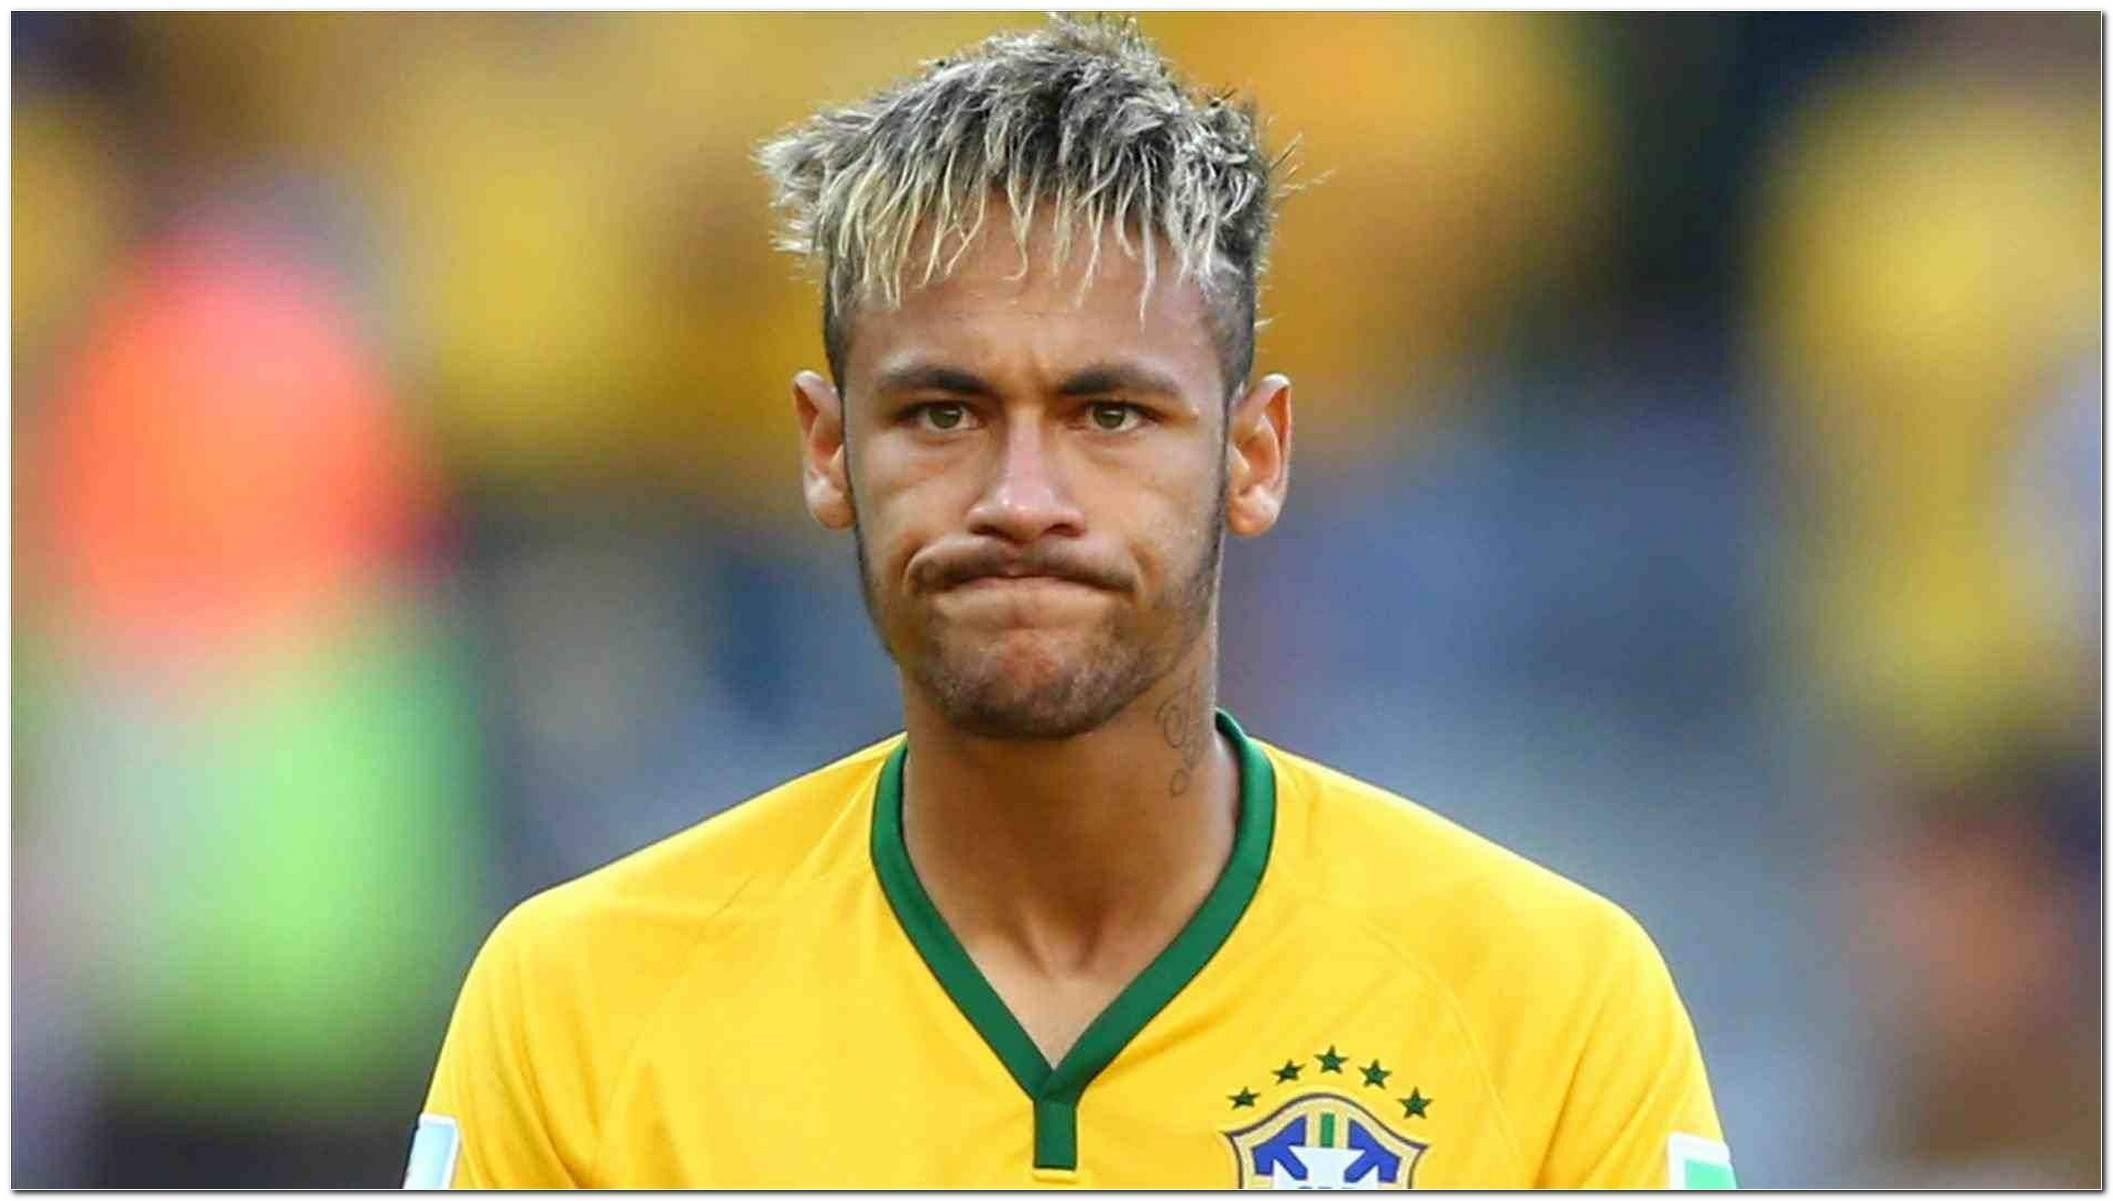 Neymar Frisur 2014